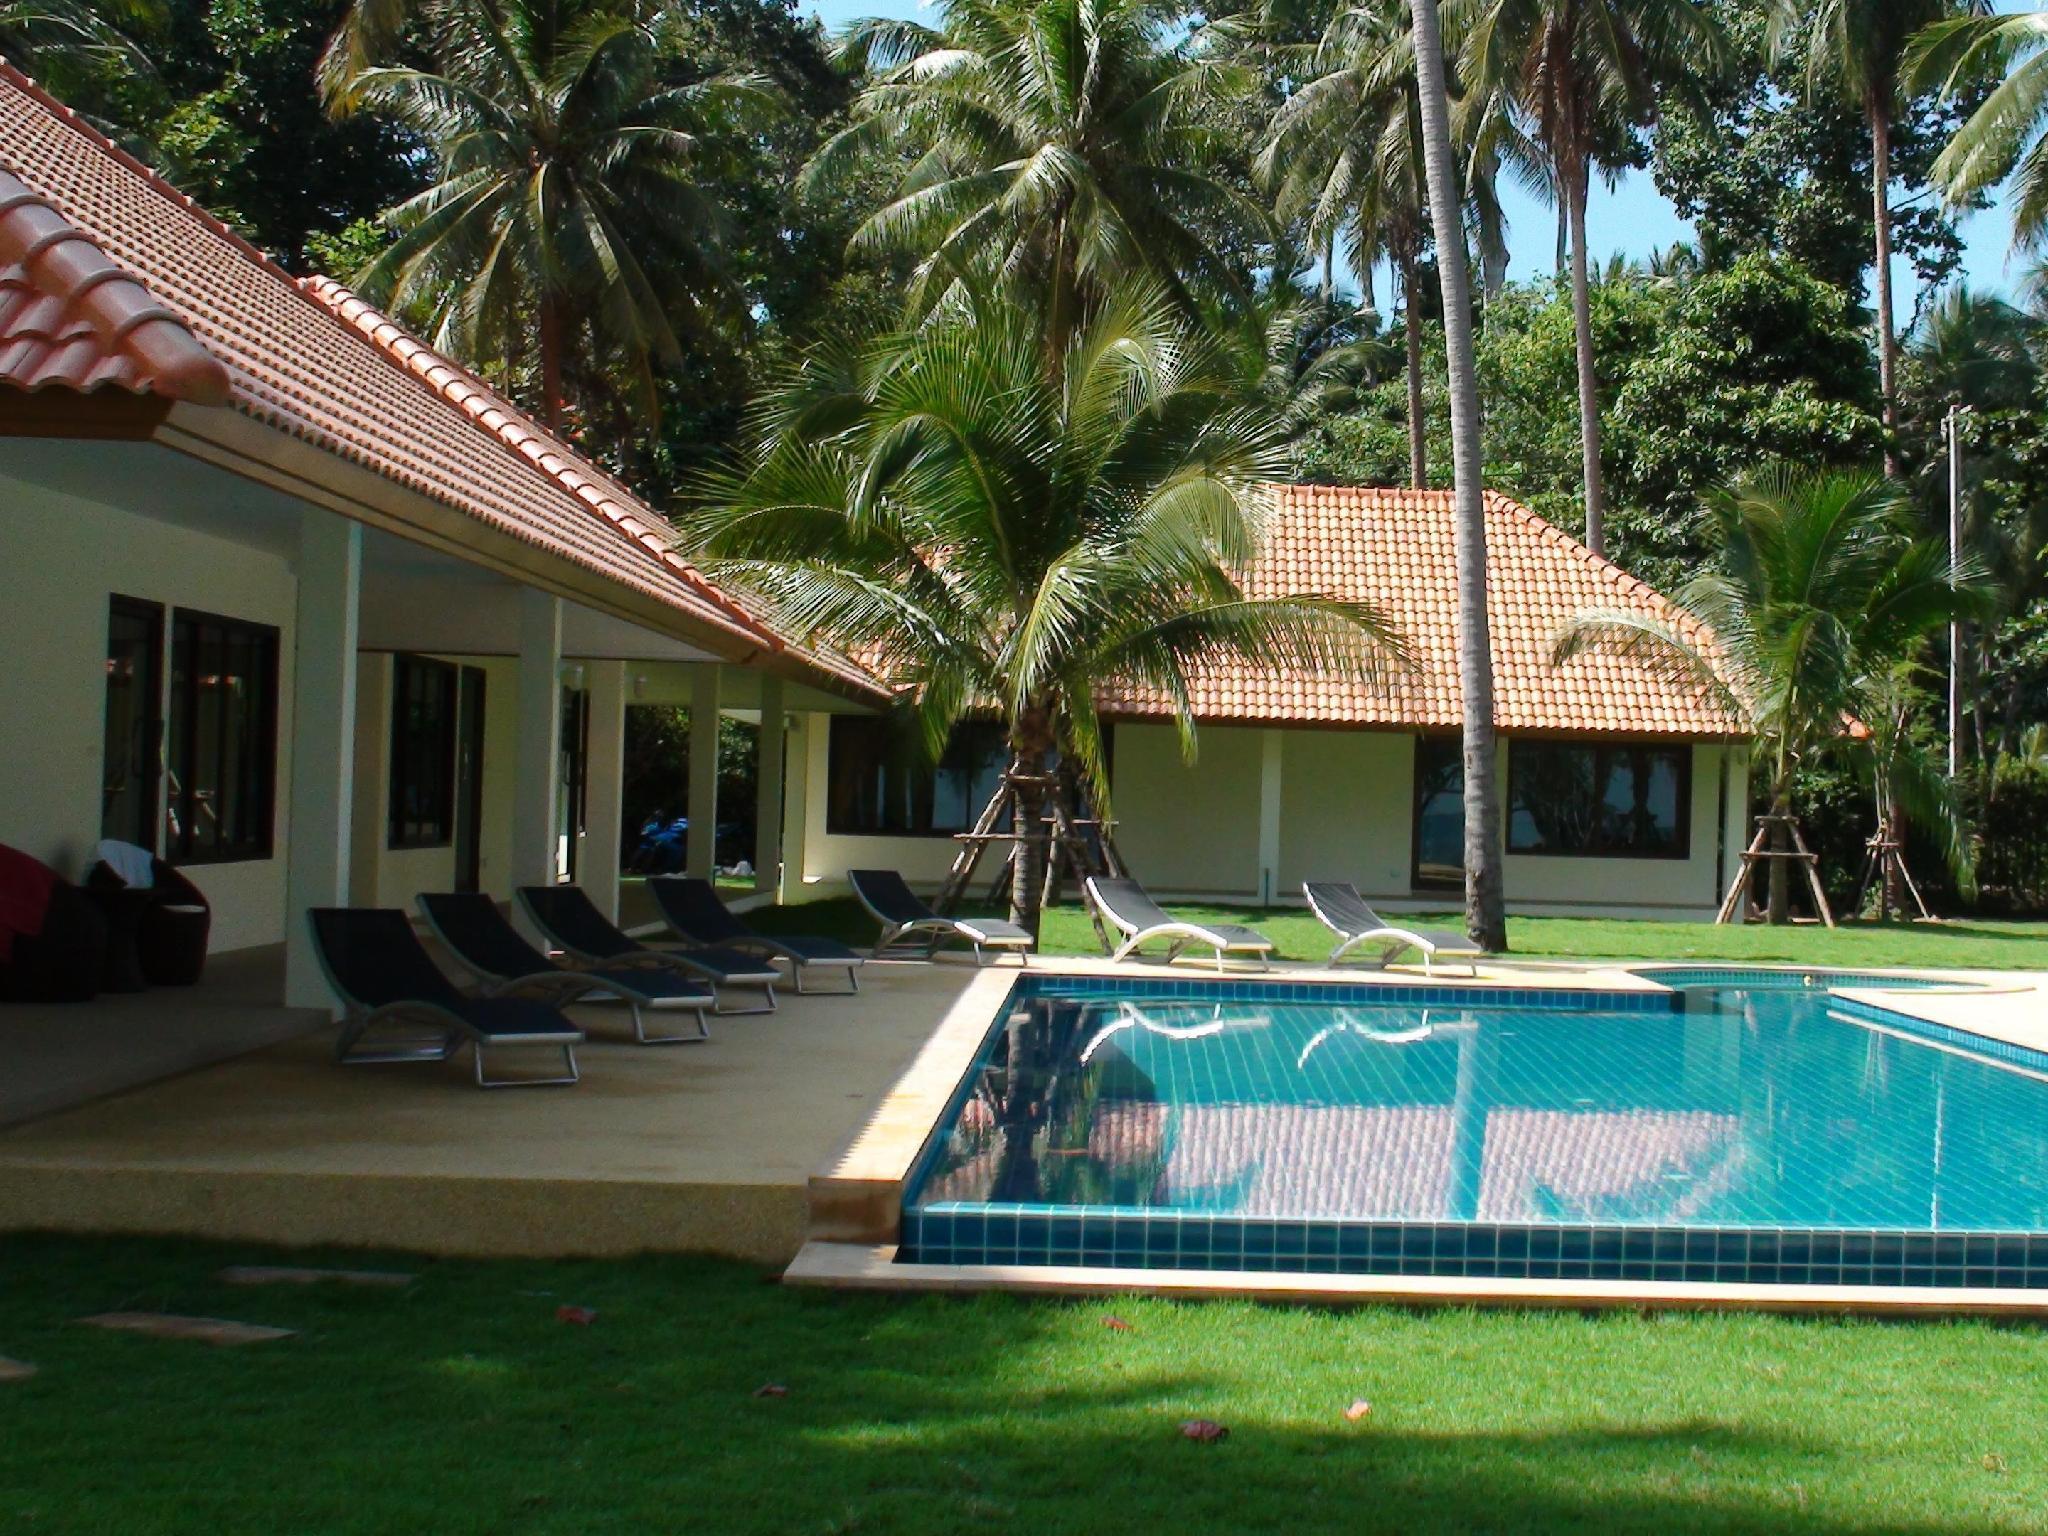 Heaven Beach Resort Koh Samui เฮเว่น บีช รีสอร์ท เกาะ สมุย